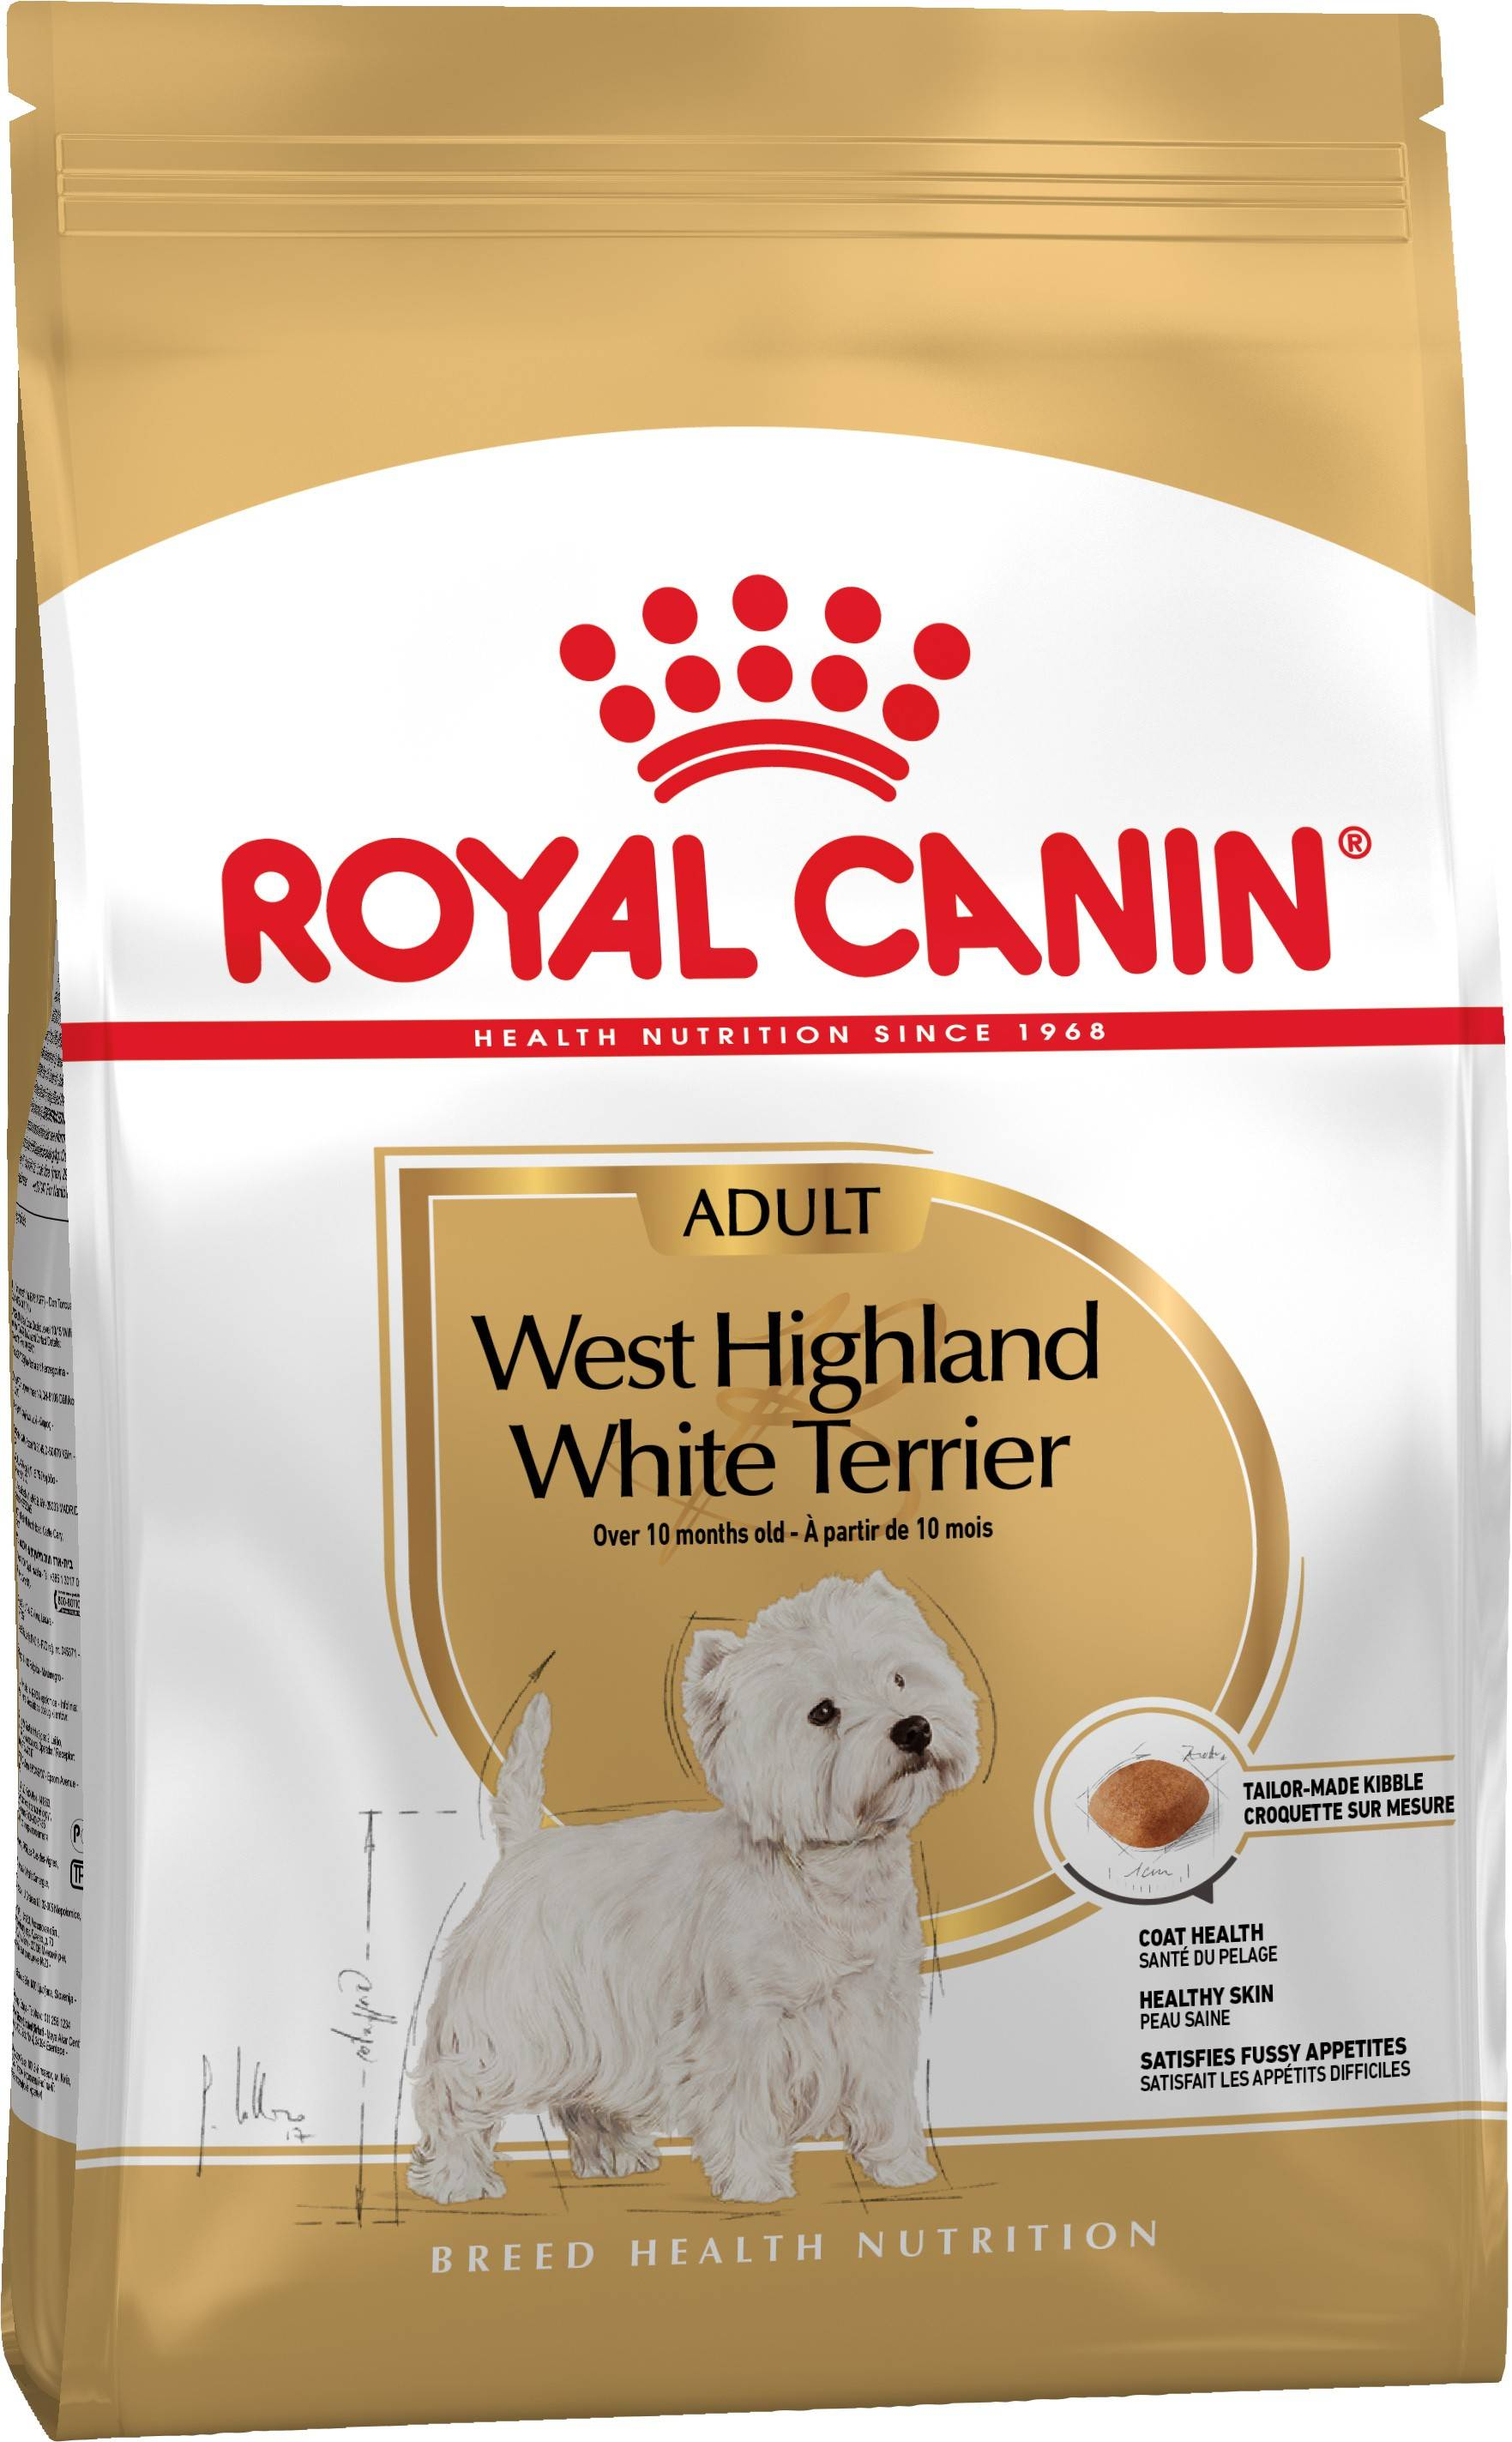 ROYAL CANIN WEST HIGHLAND WHITE TERRIER ADULT – сухий корм для дорослих собак породи вест-хайленд-уайт-тер'єр